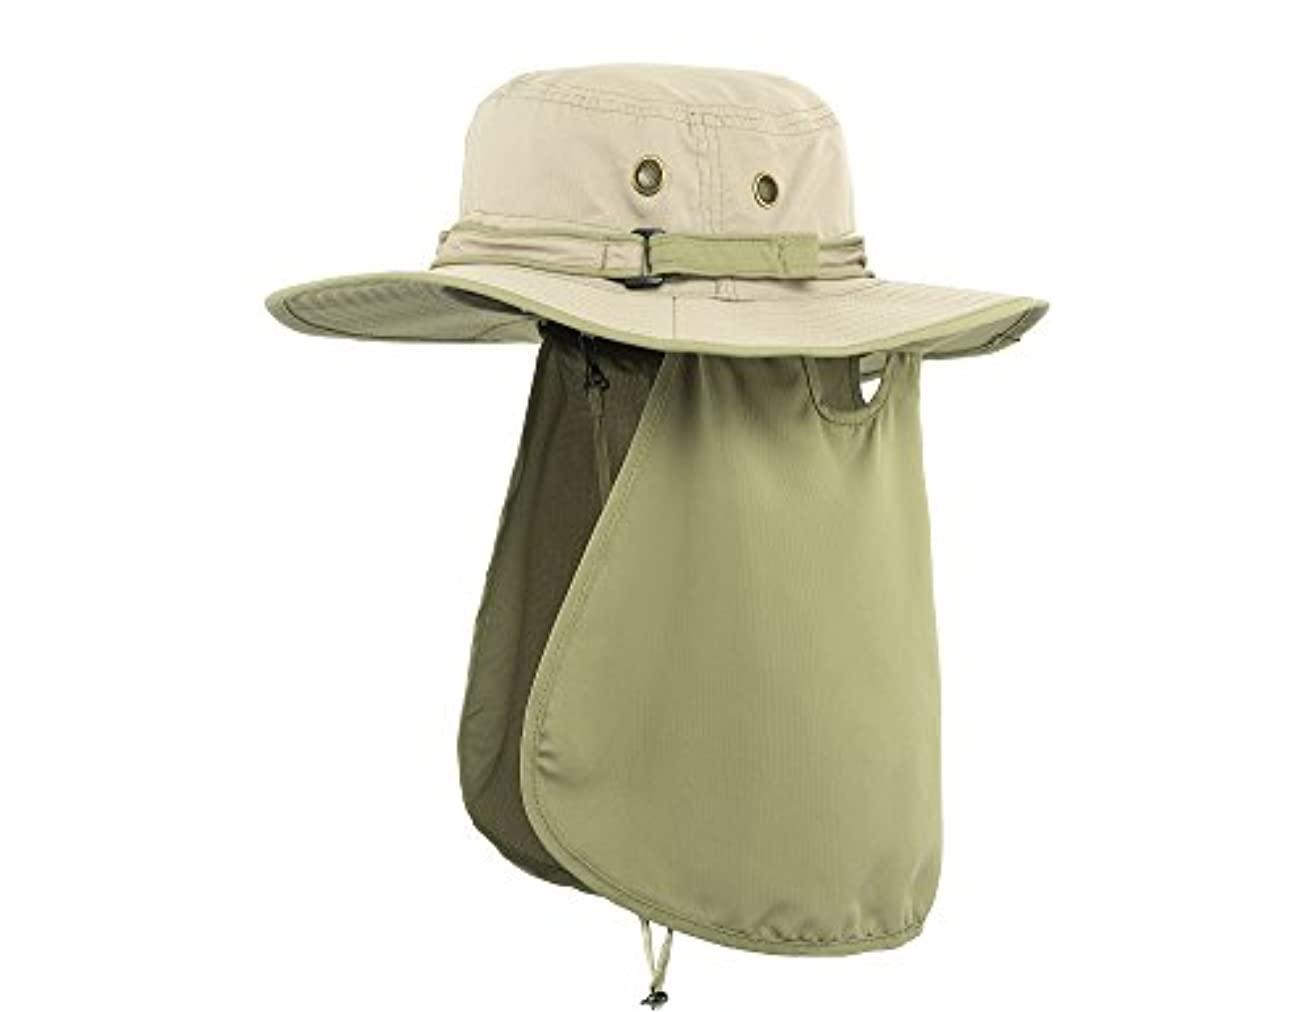 Hollosport 釣り用バケツ サンハット フラップネックカバー付き メンズ レディース 22~24インチ 超紫外線保護 アウトドア活動用